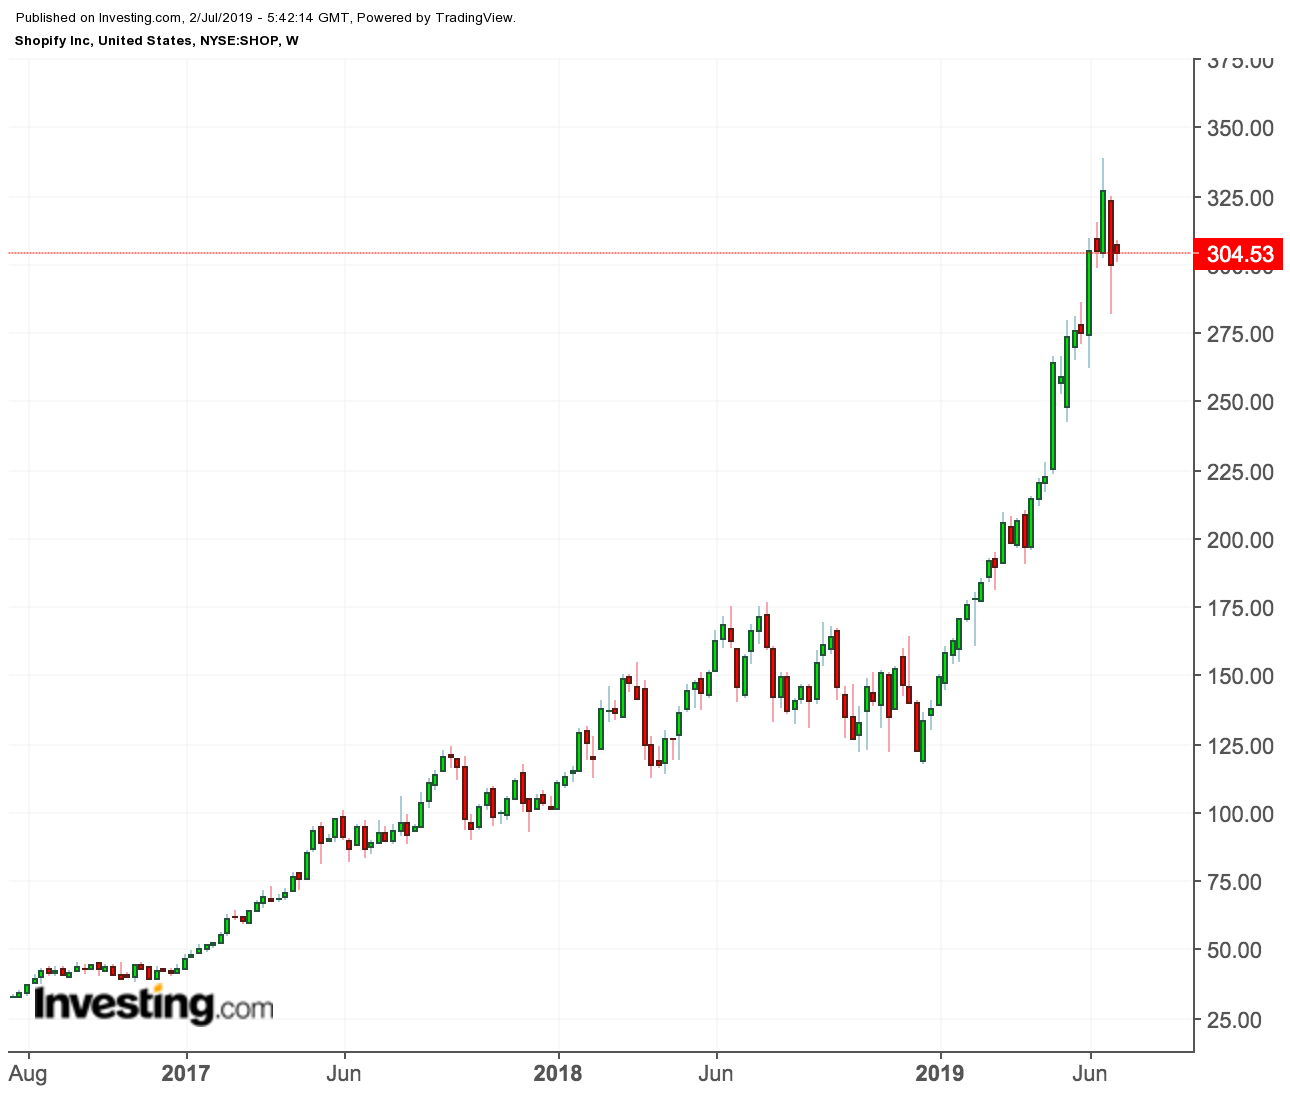 Shopify price chart